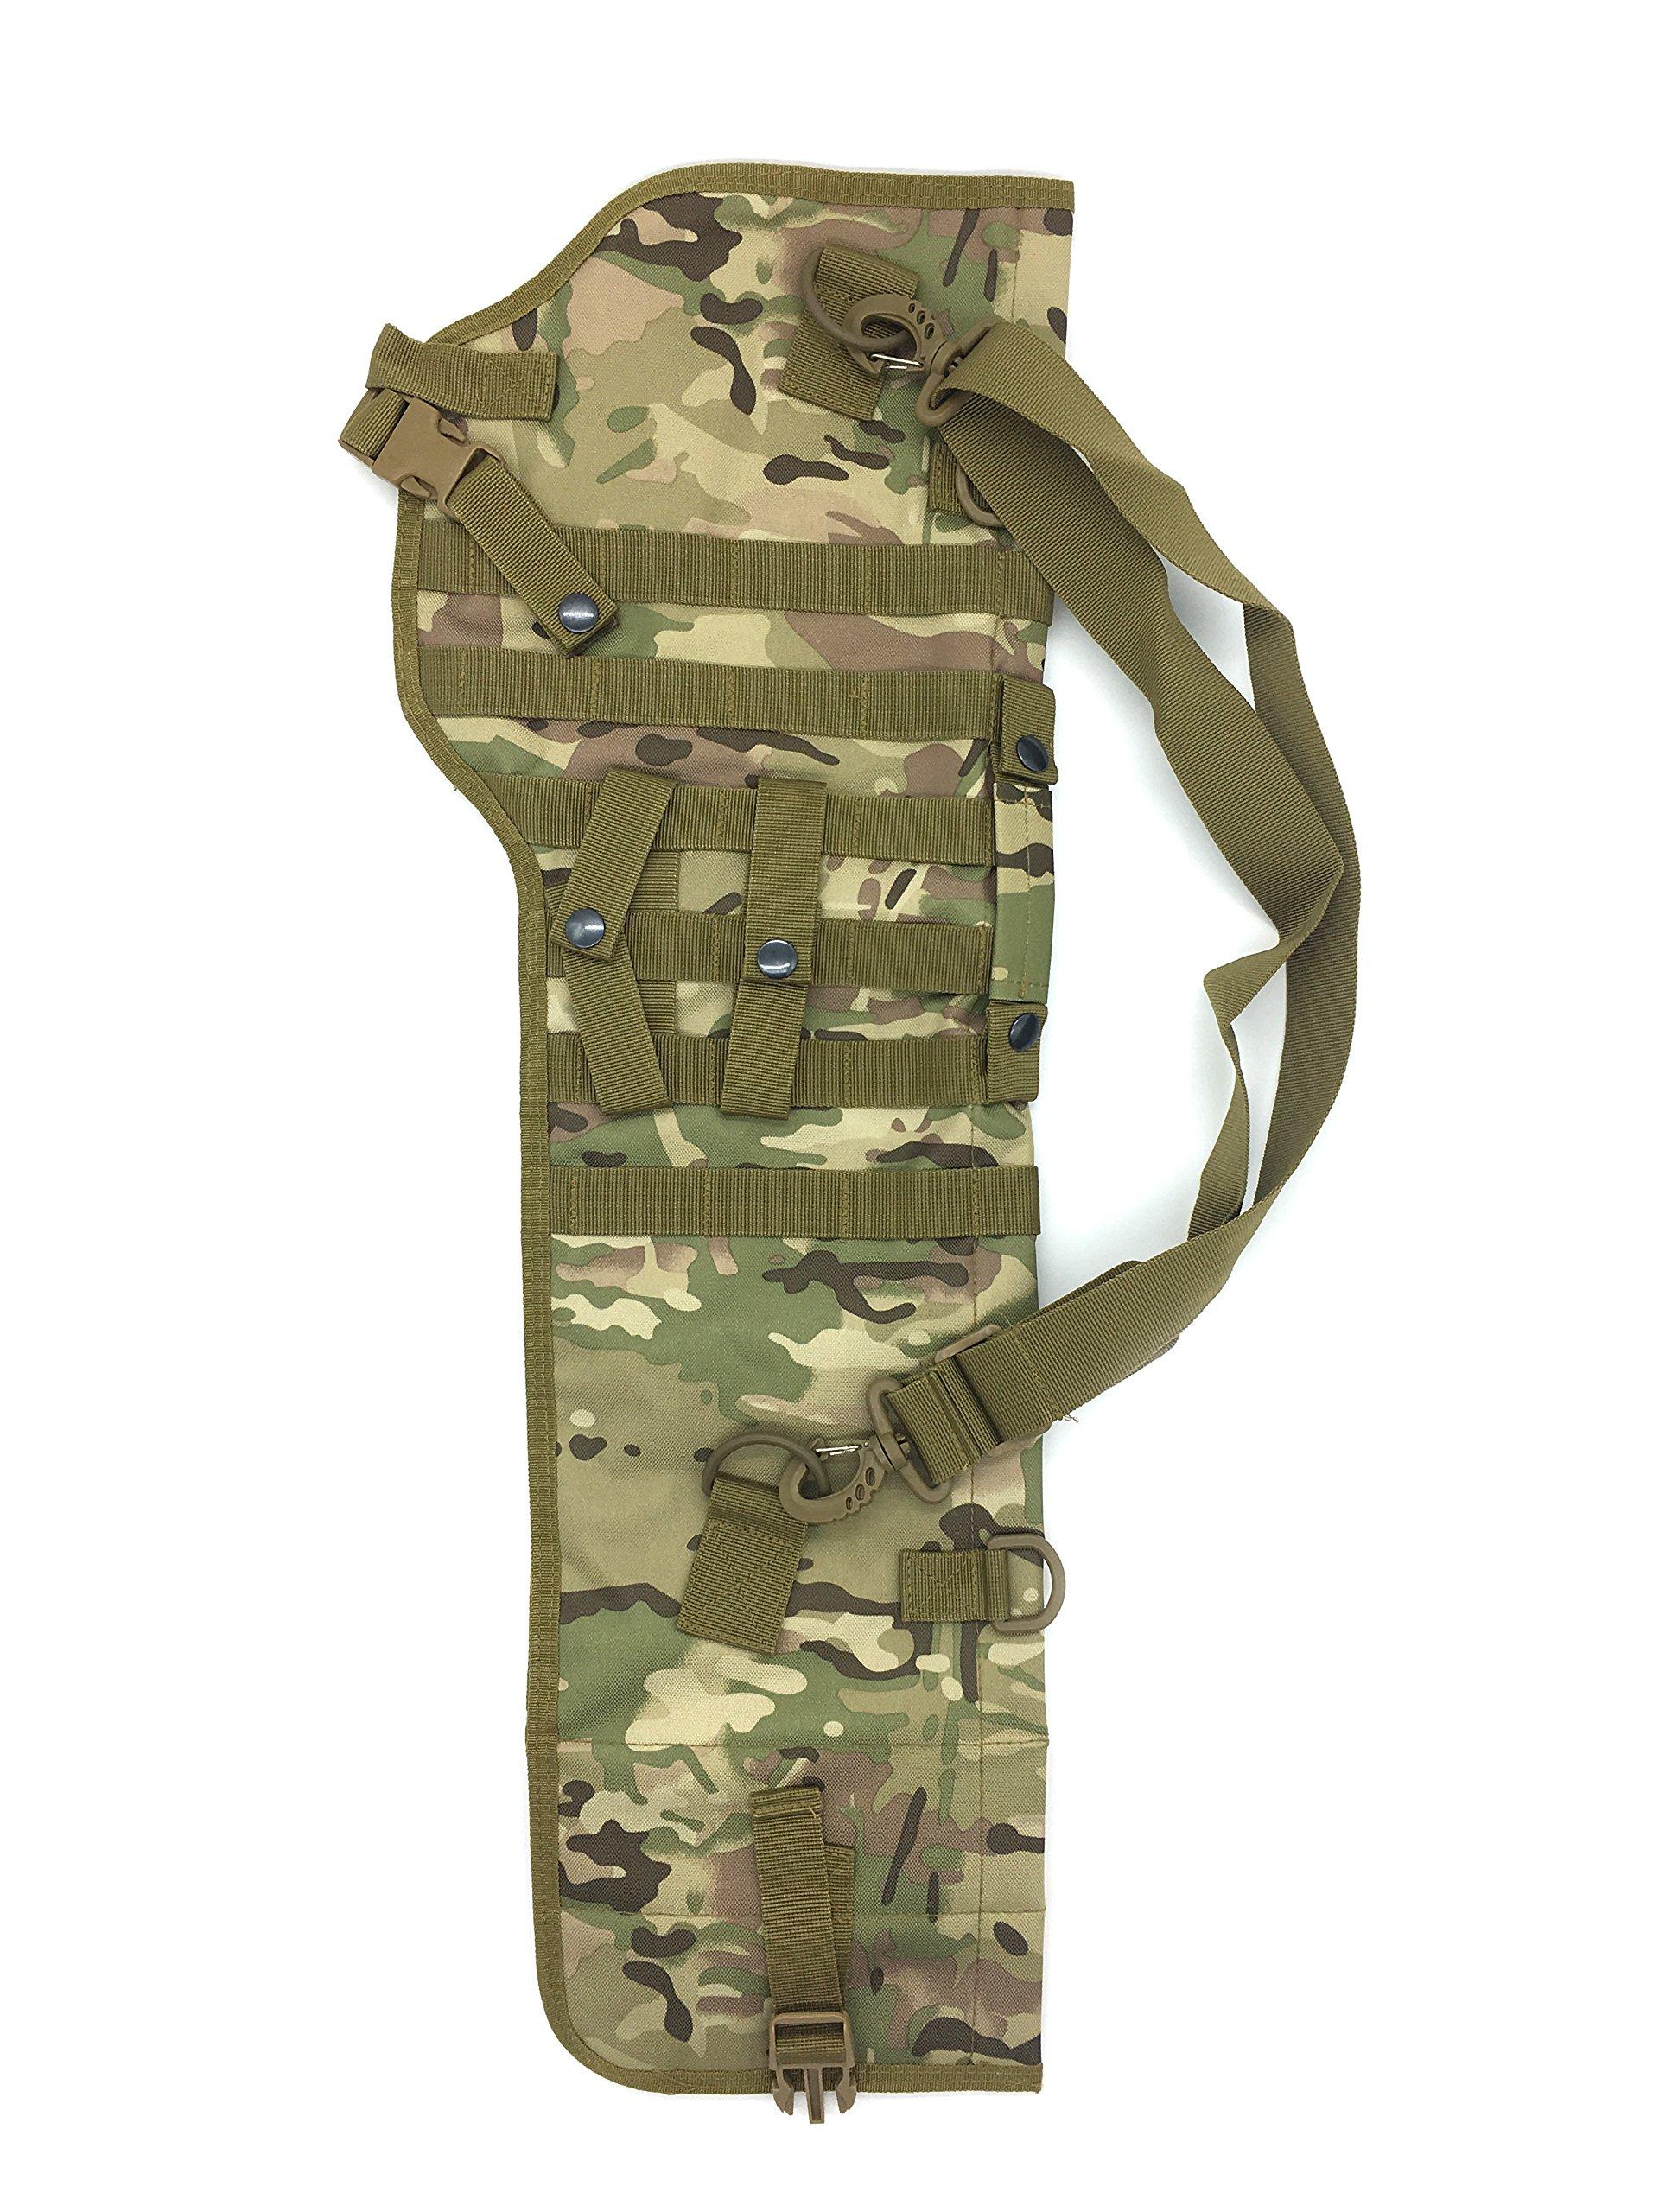 Silfrae Tactical Shotgun Rifle Scabbard Bag Shoulder Bag (Camo Brown) by Silfrae